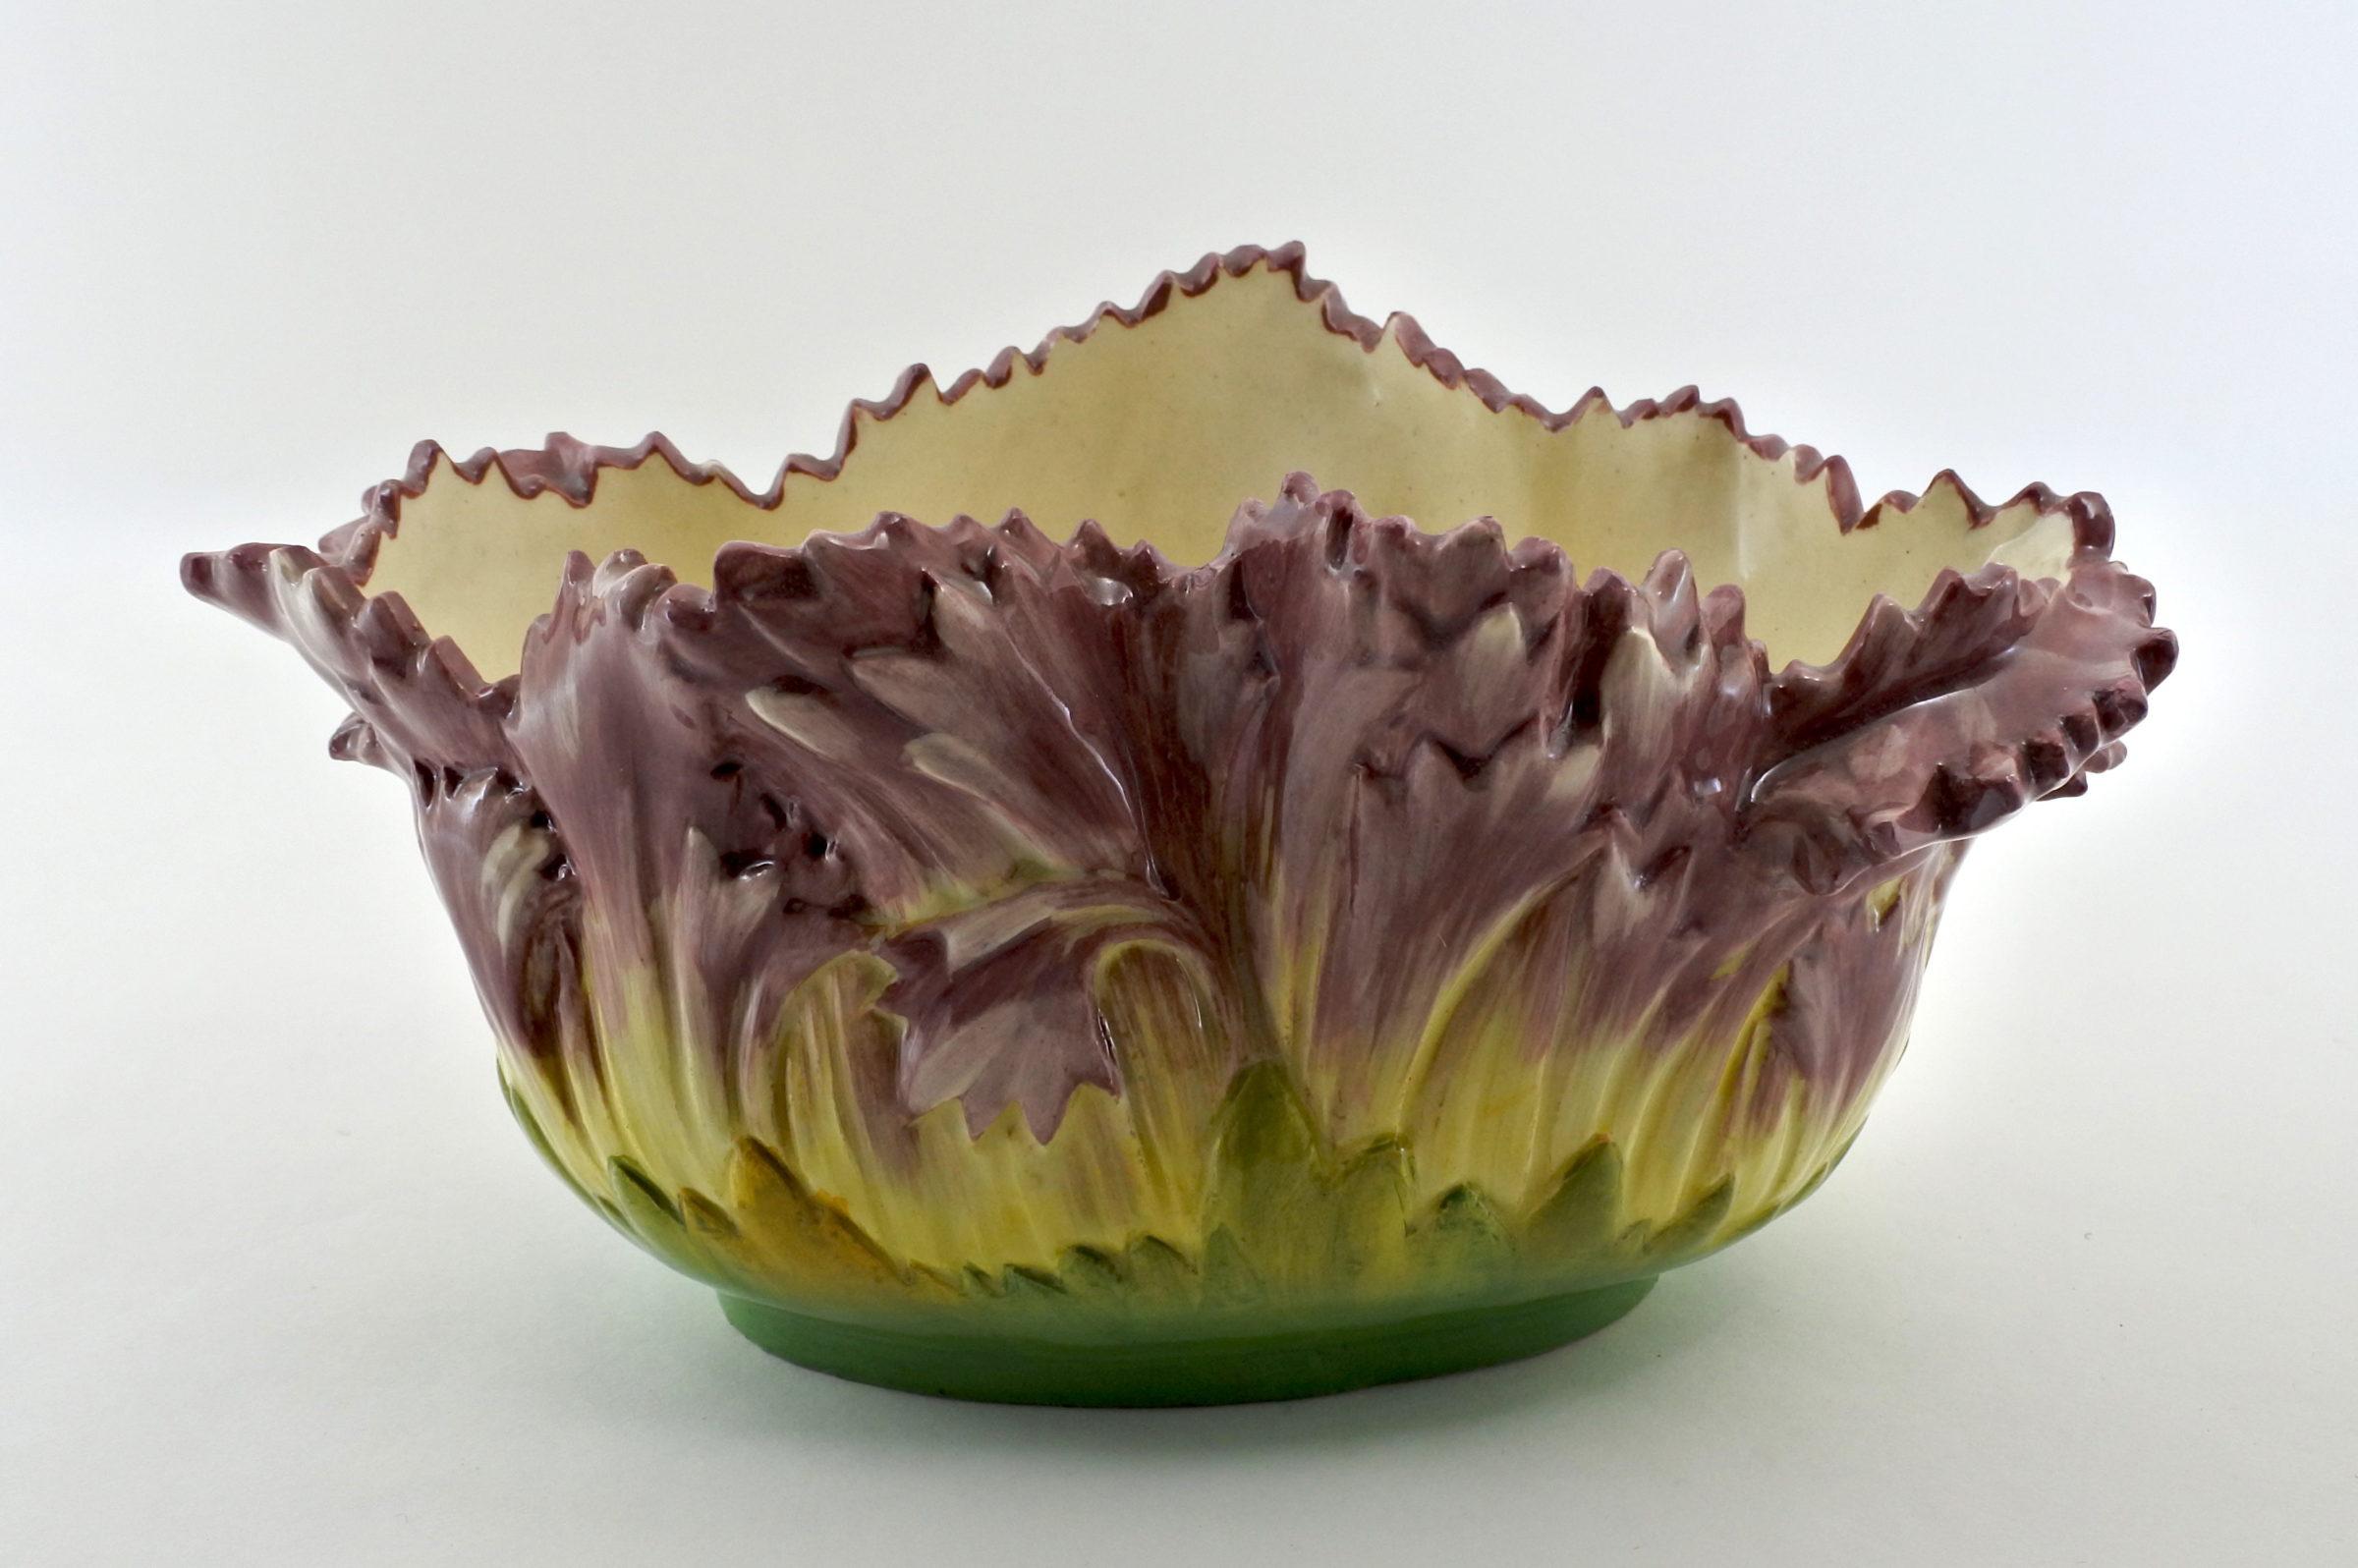 Jardinière Massier in ceramica barbotine con fiori